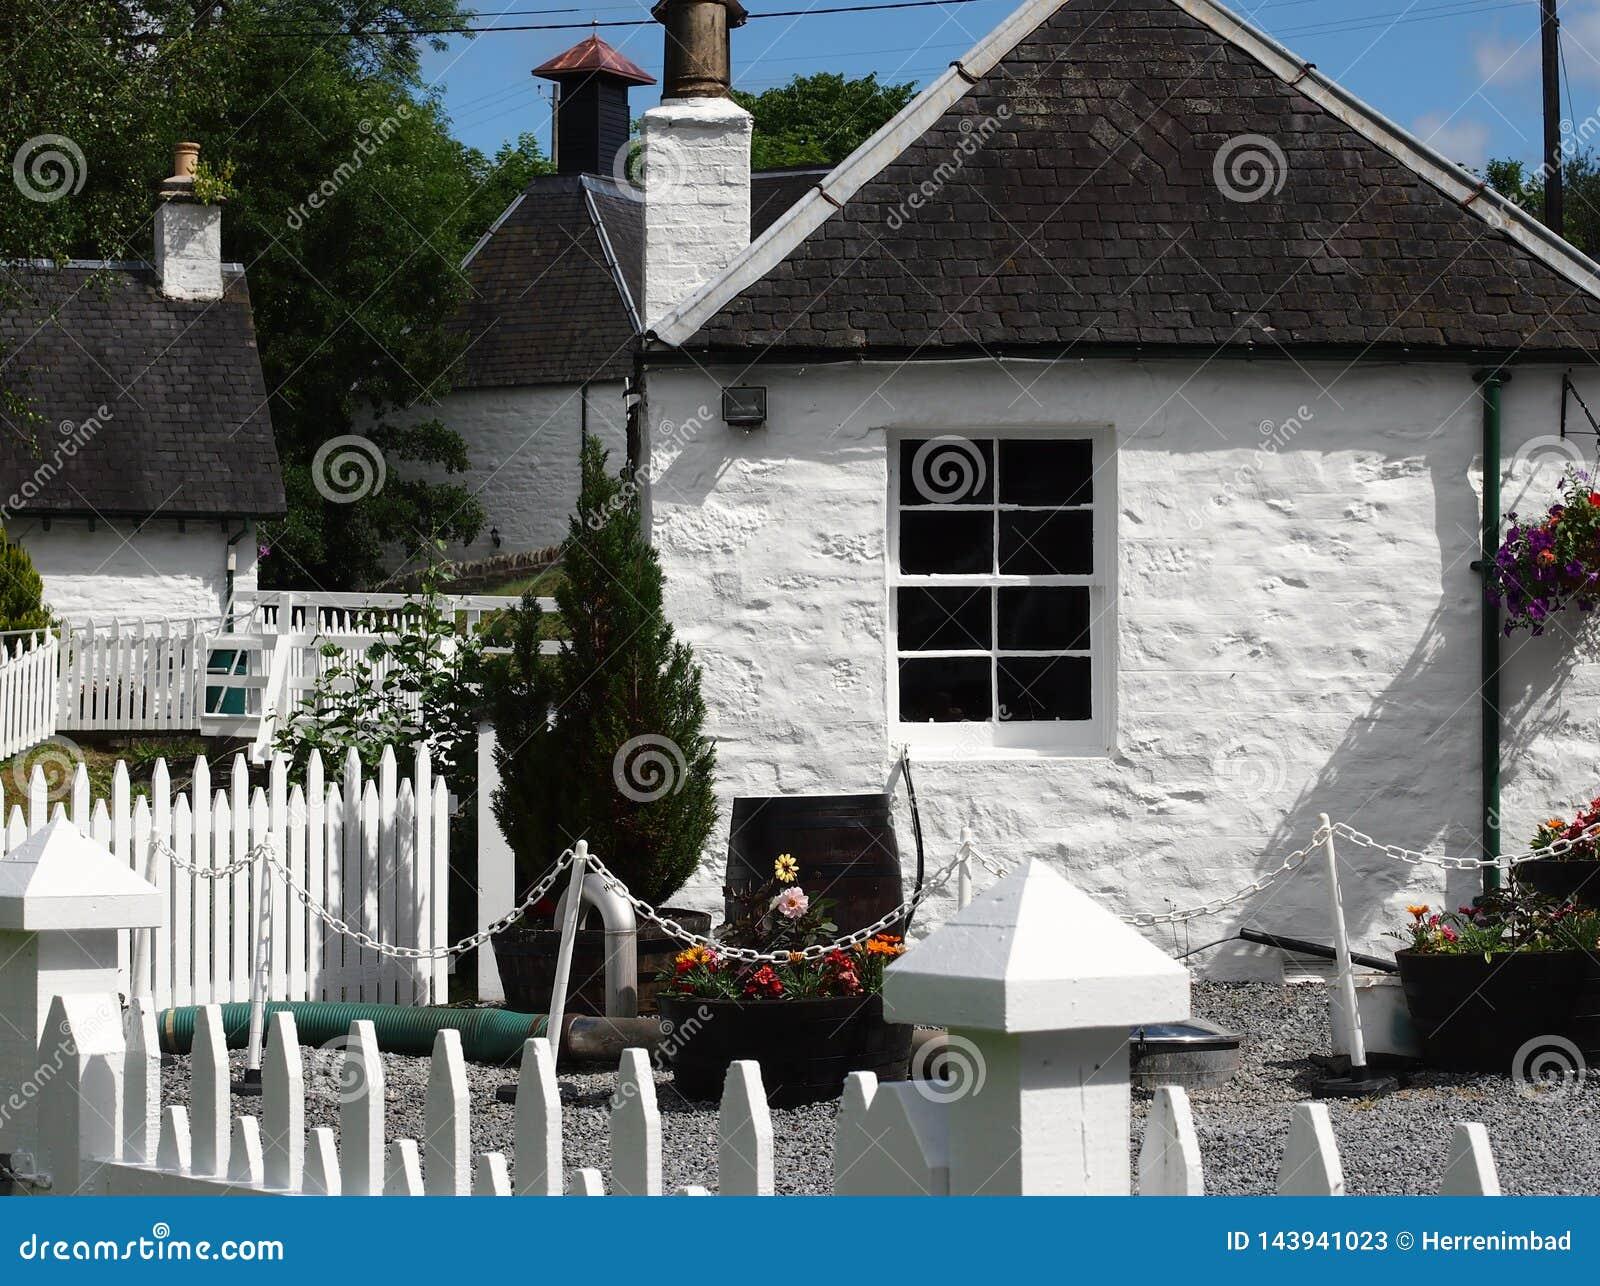 White houses in Scotland